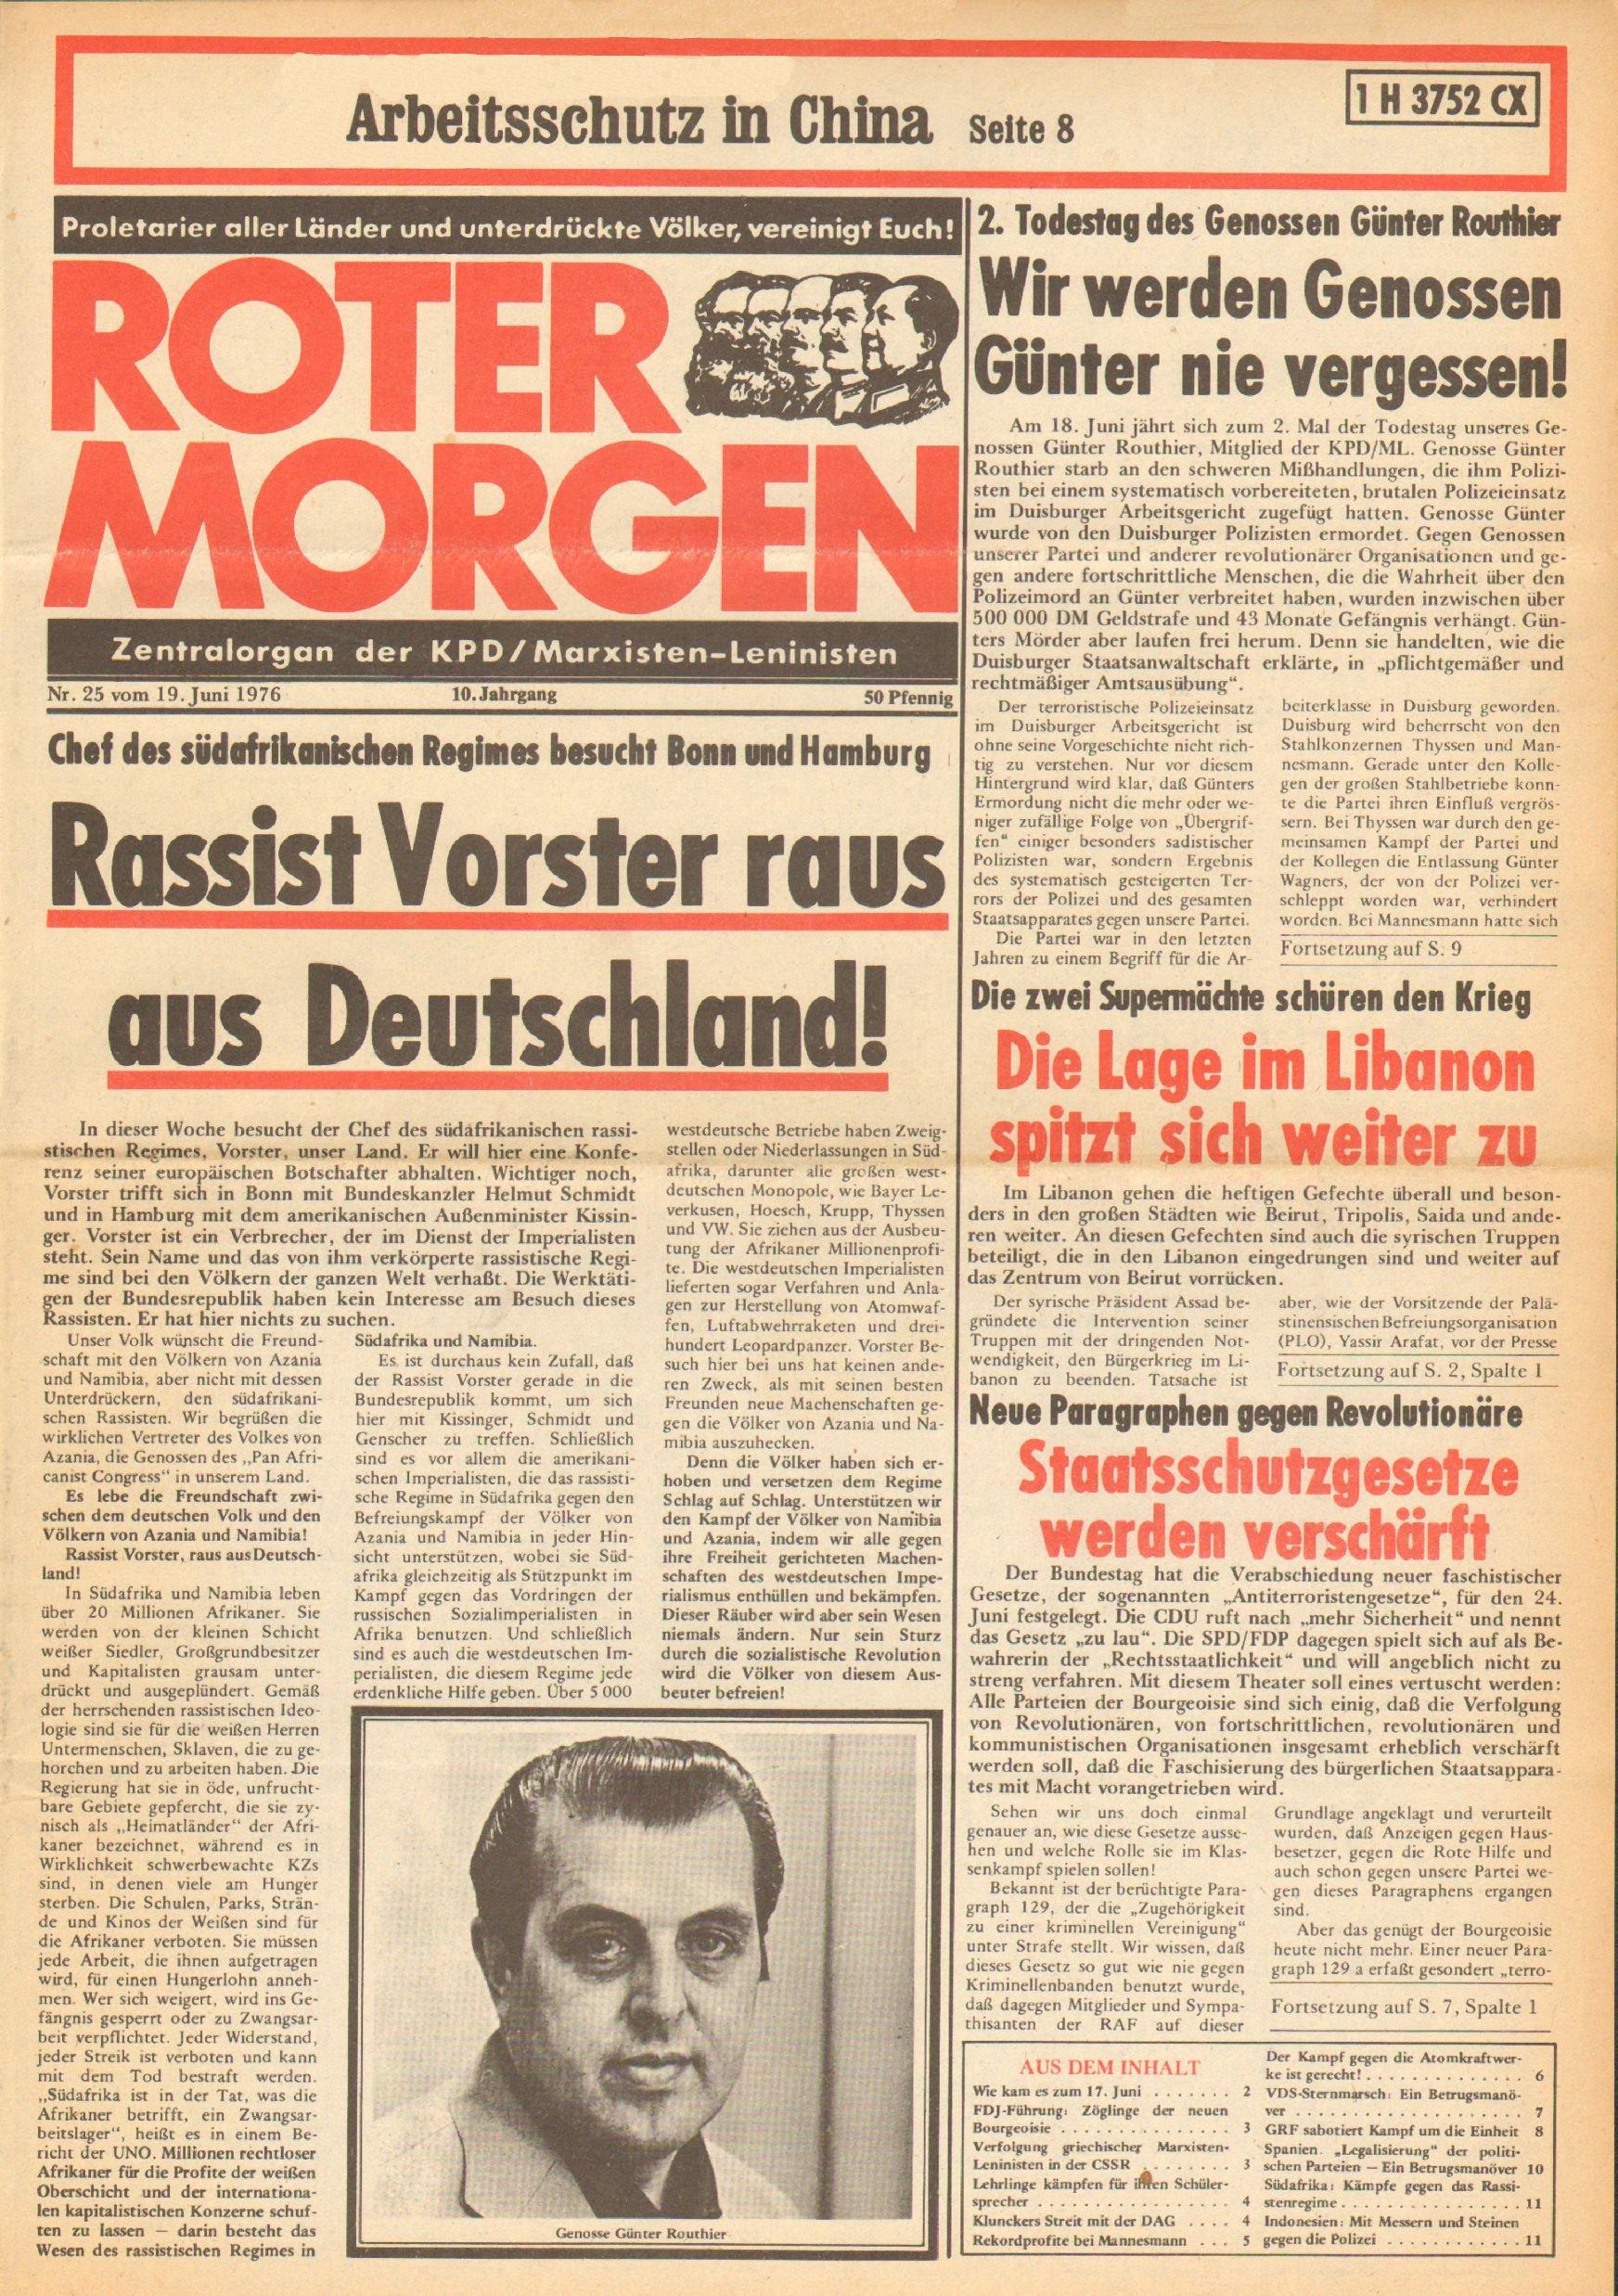 Roter Morgen, 10. Jg., 19. Juni 1976, Nr. 25, Seite 1